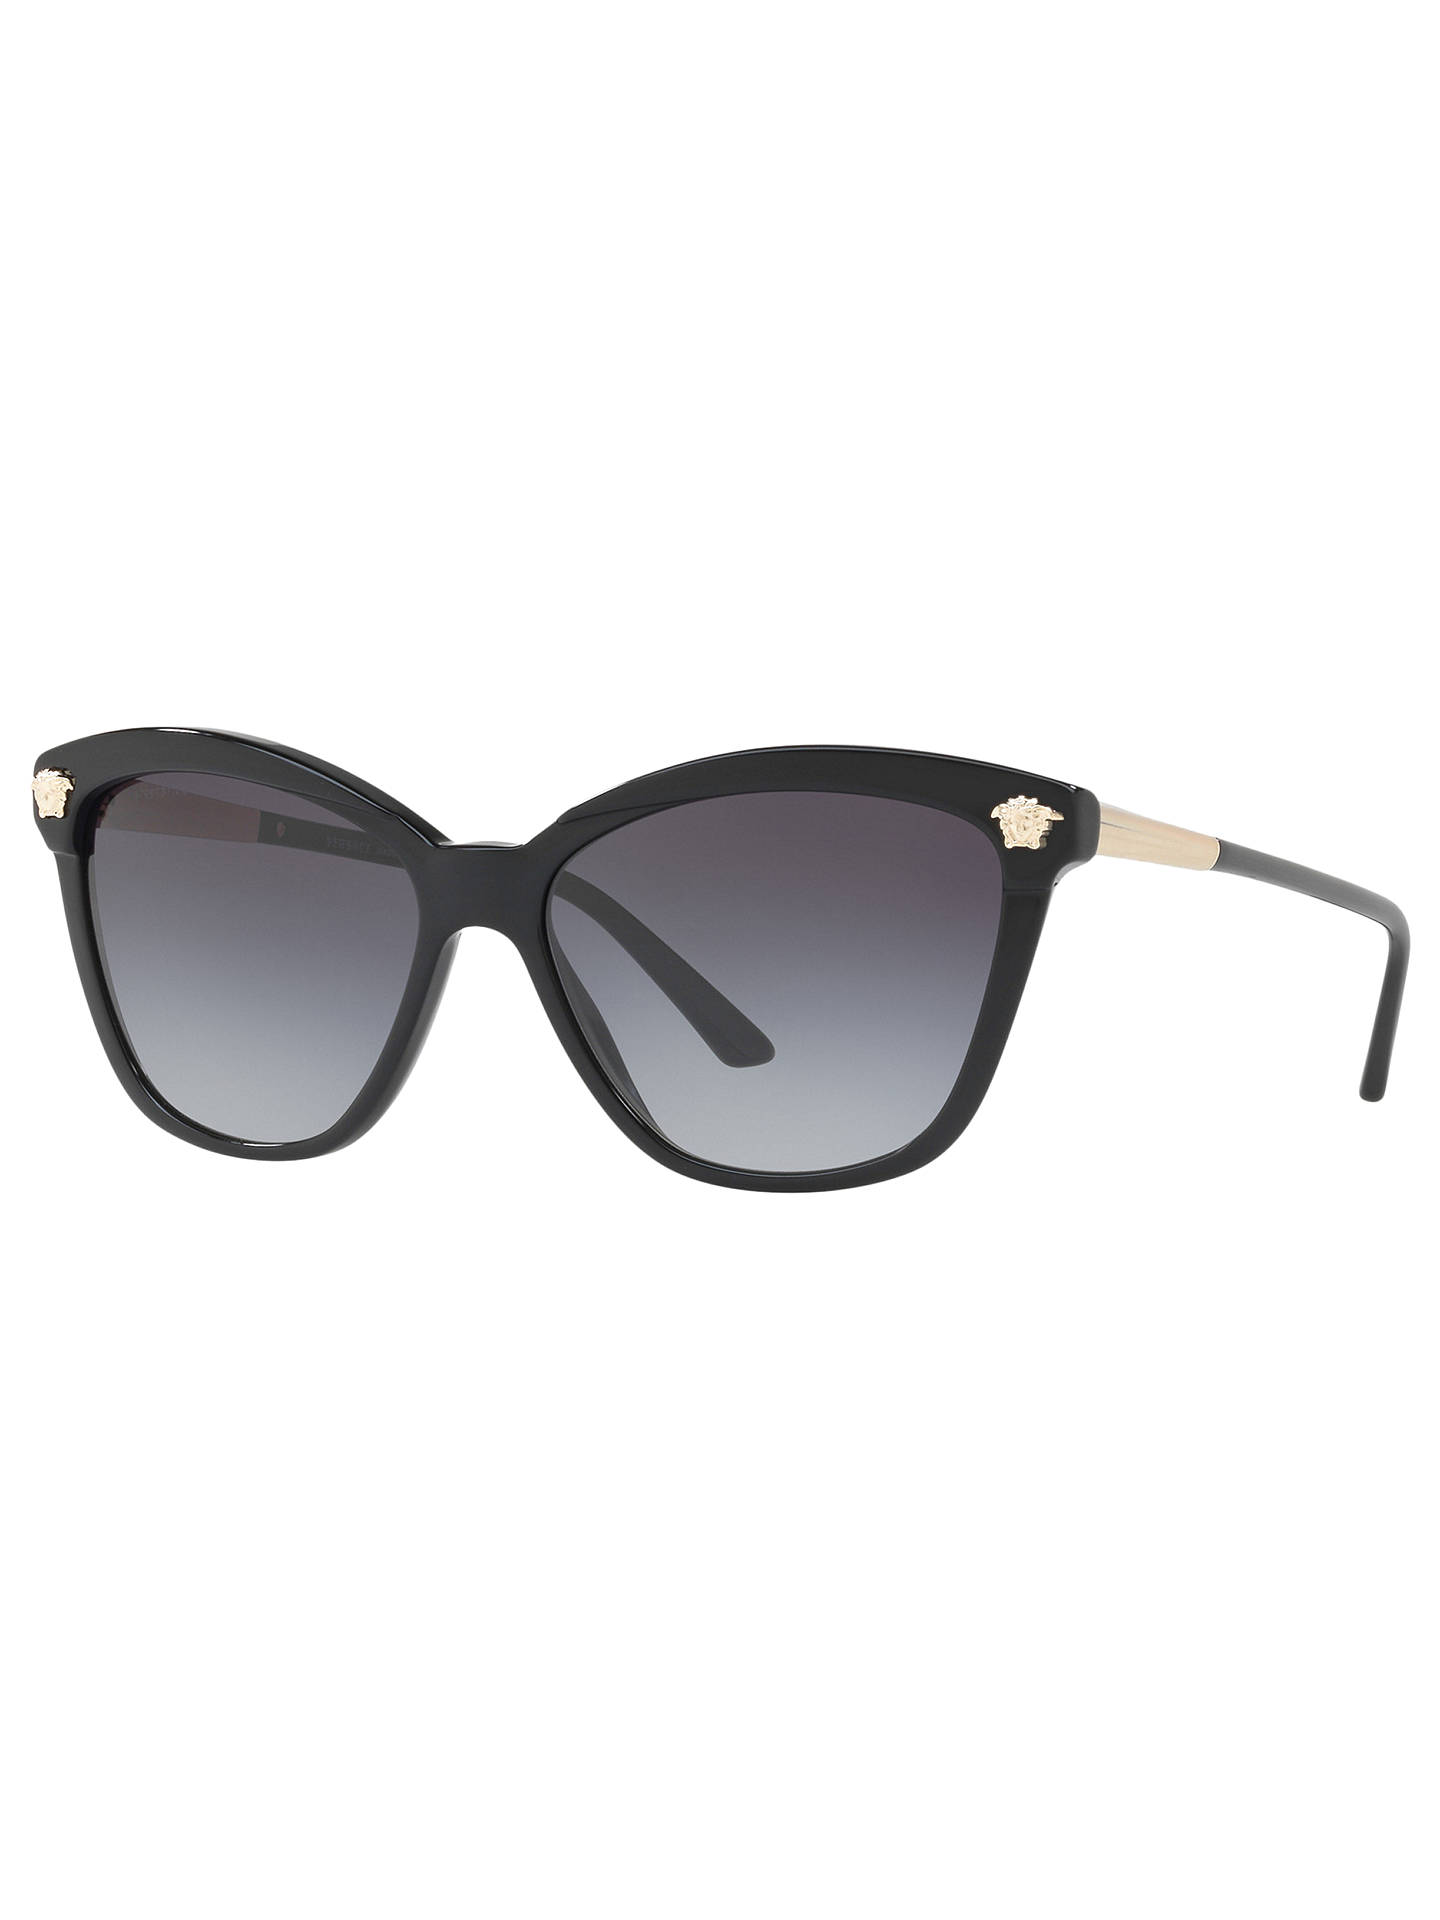 72f6b2c6a9b Buy Versace VE4313 Women s Rectangular Sunglasses